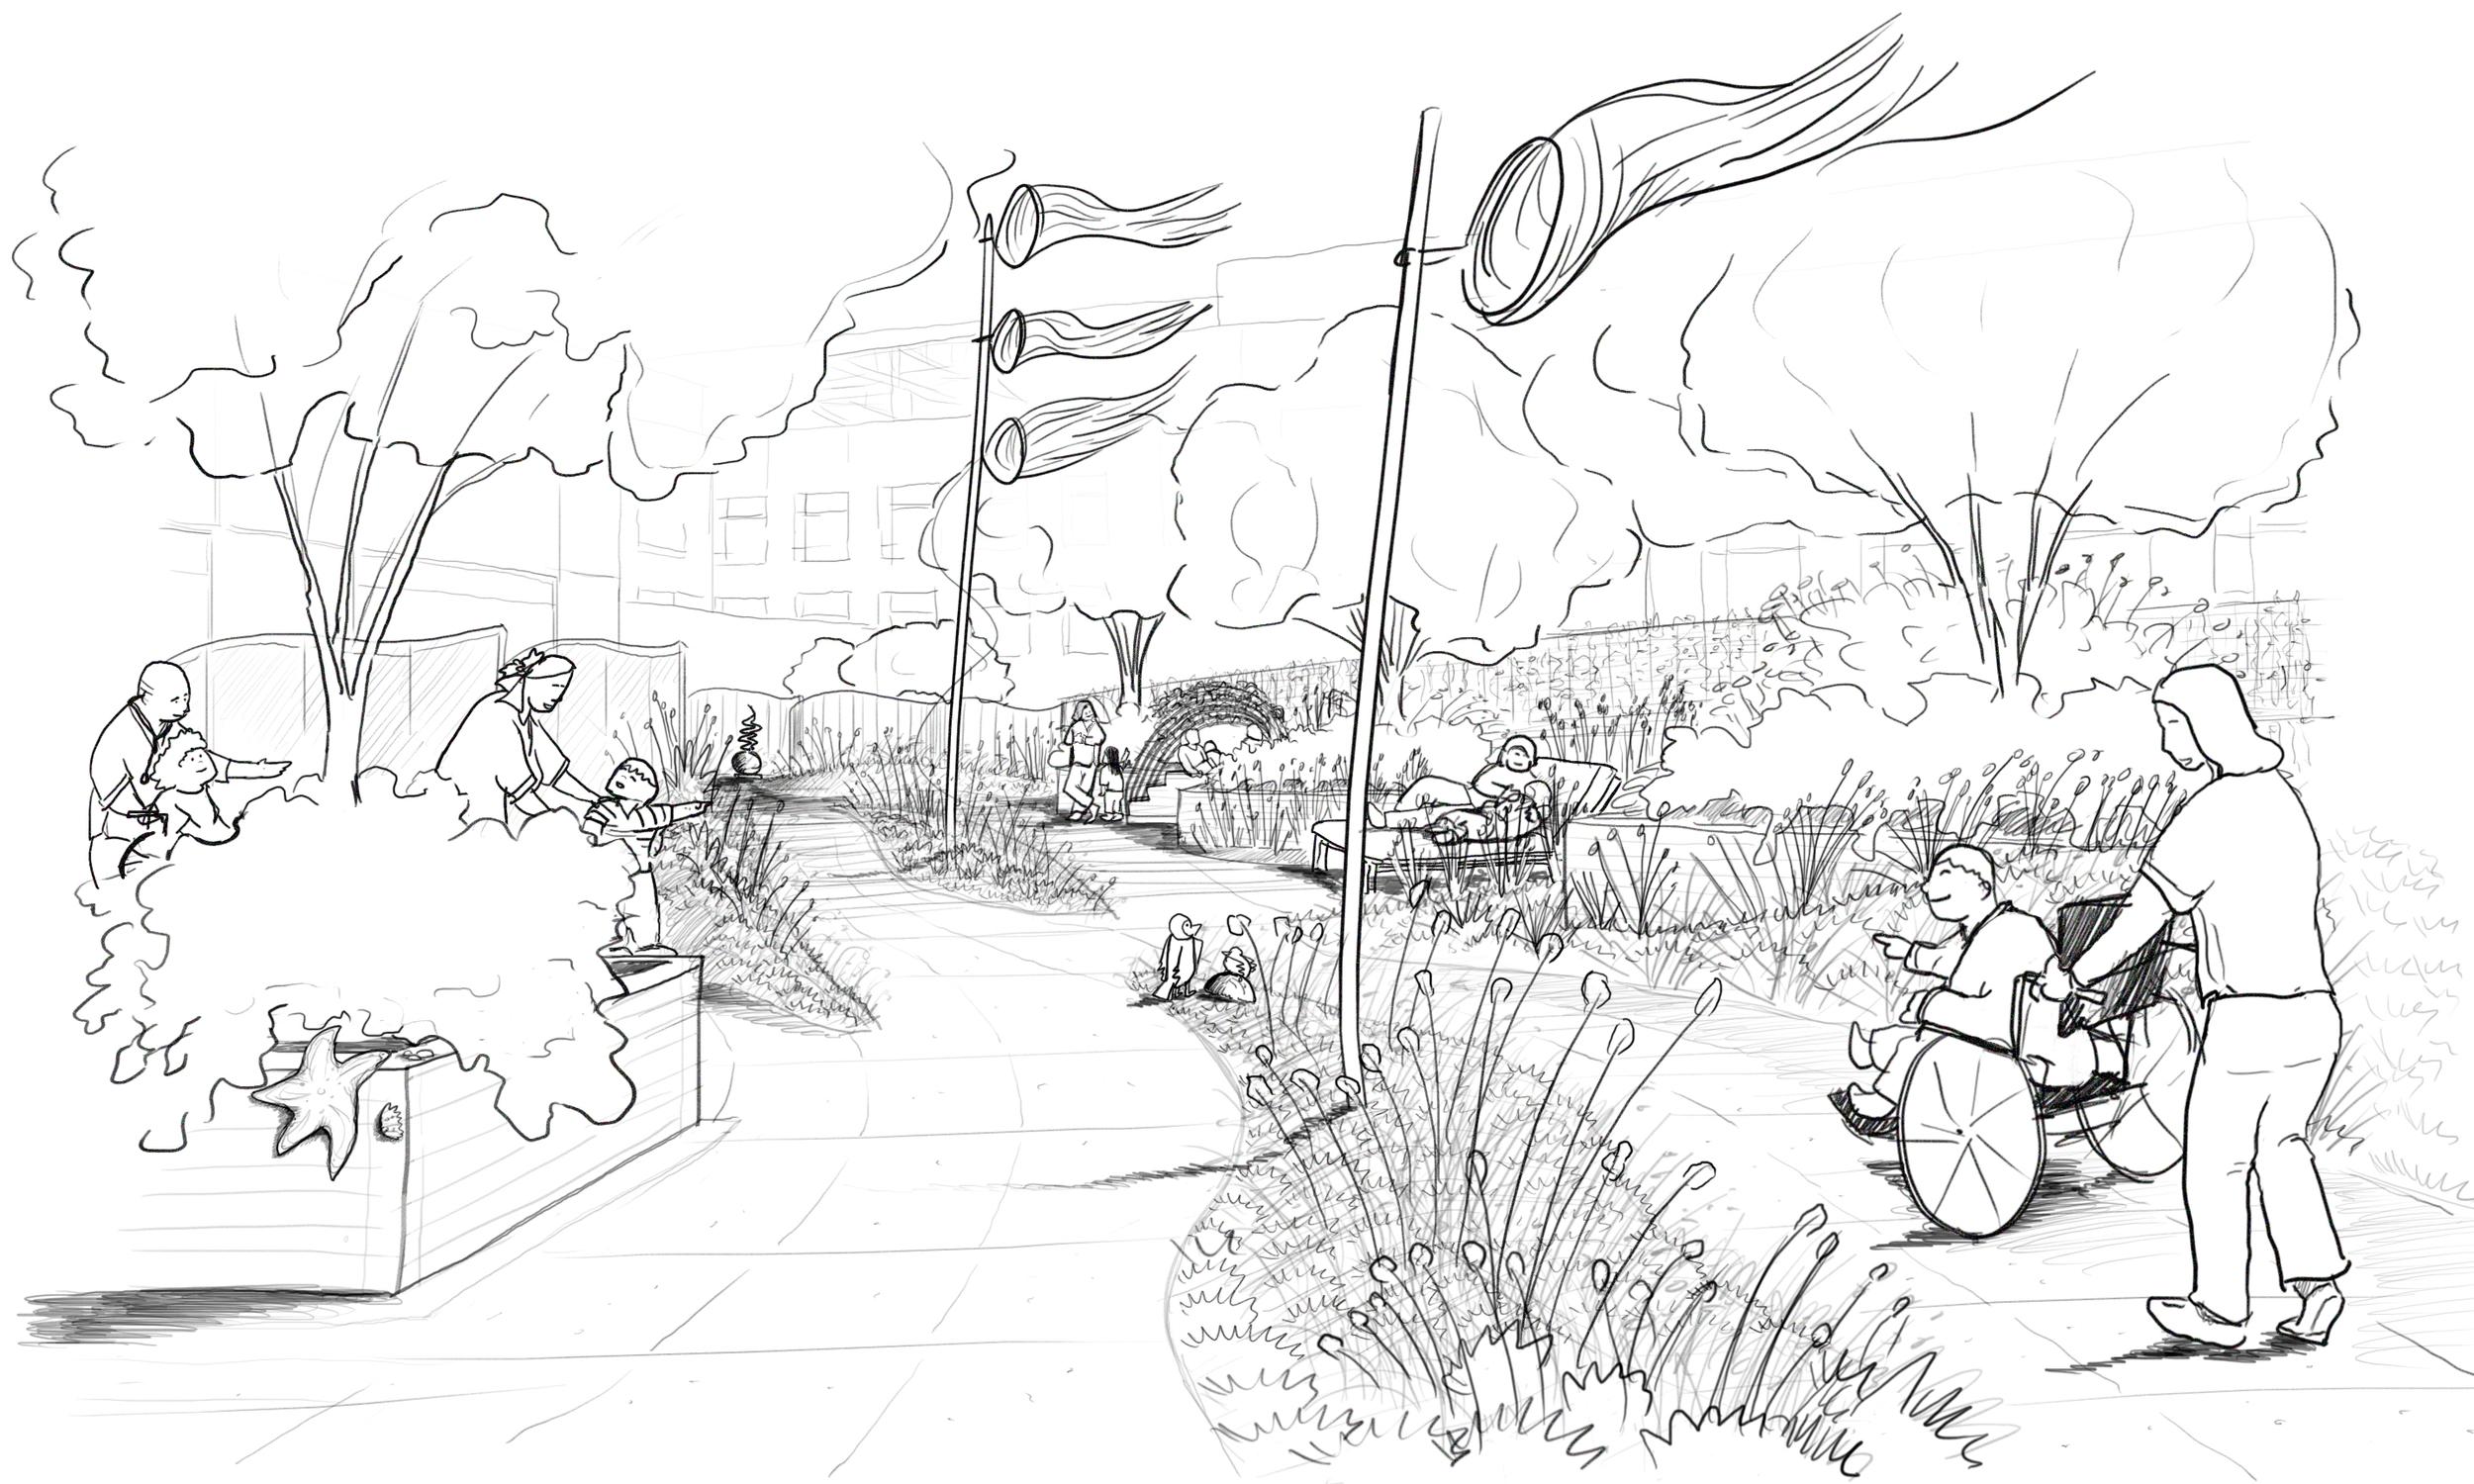 Sketch_13_4th_Flr_Childrens_Garden.jpg